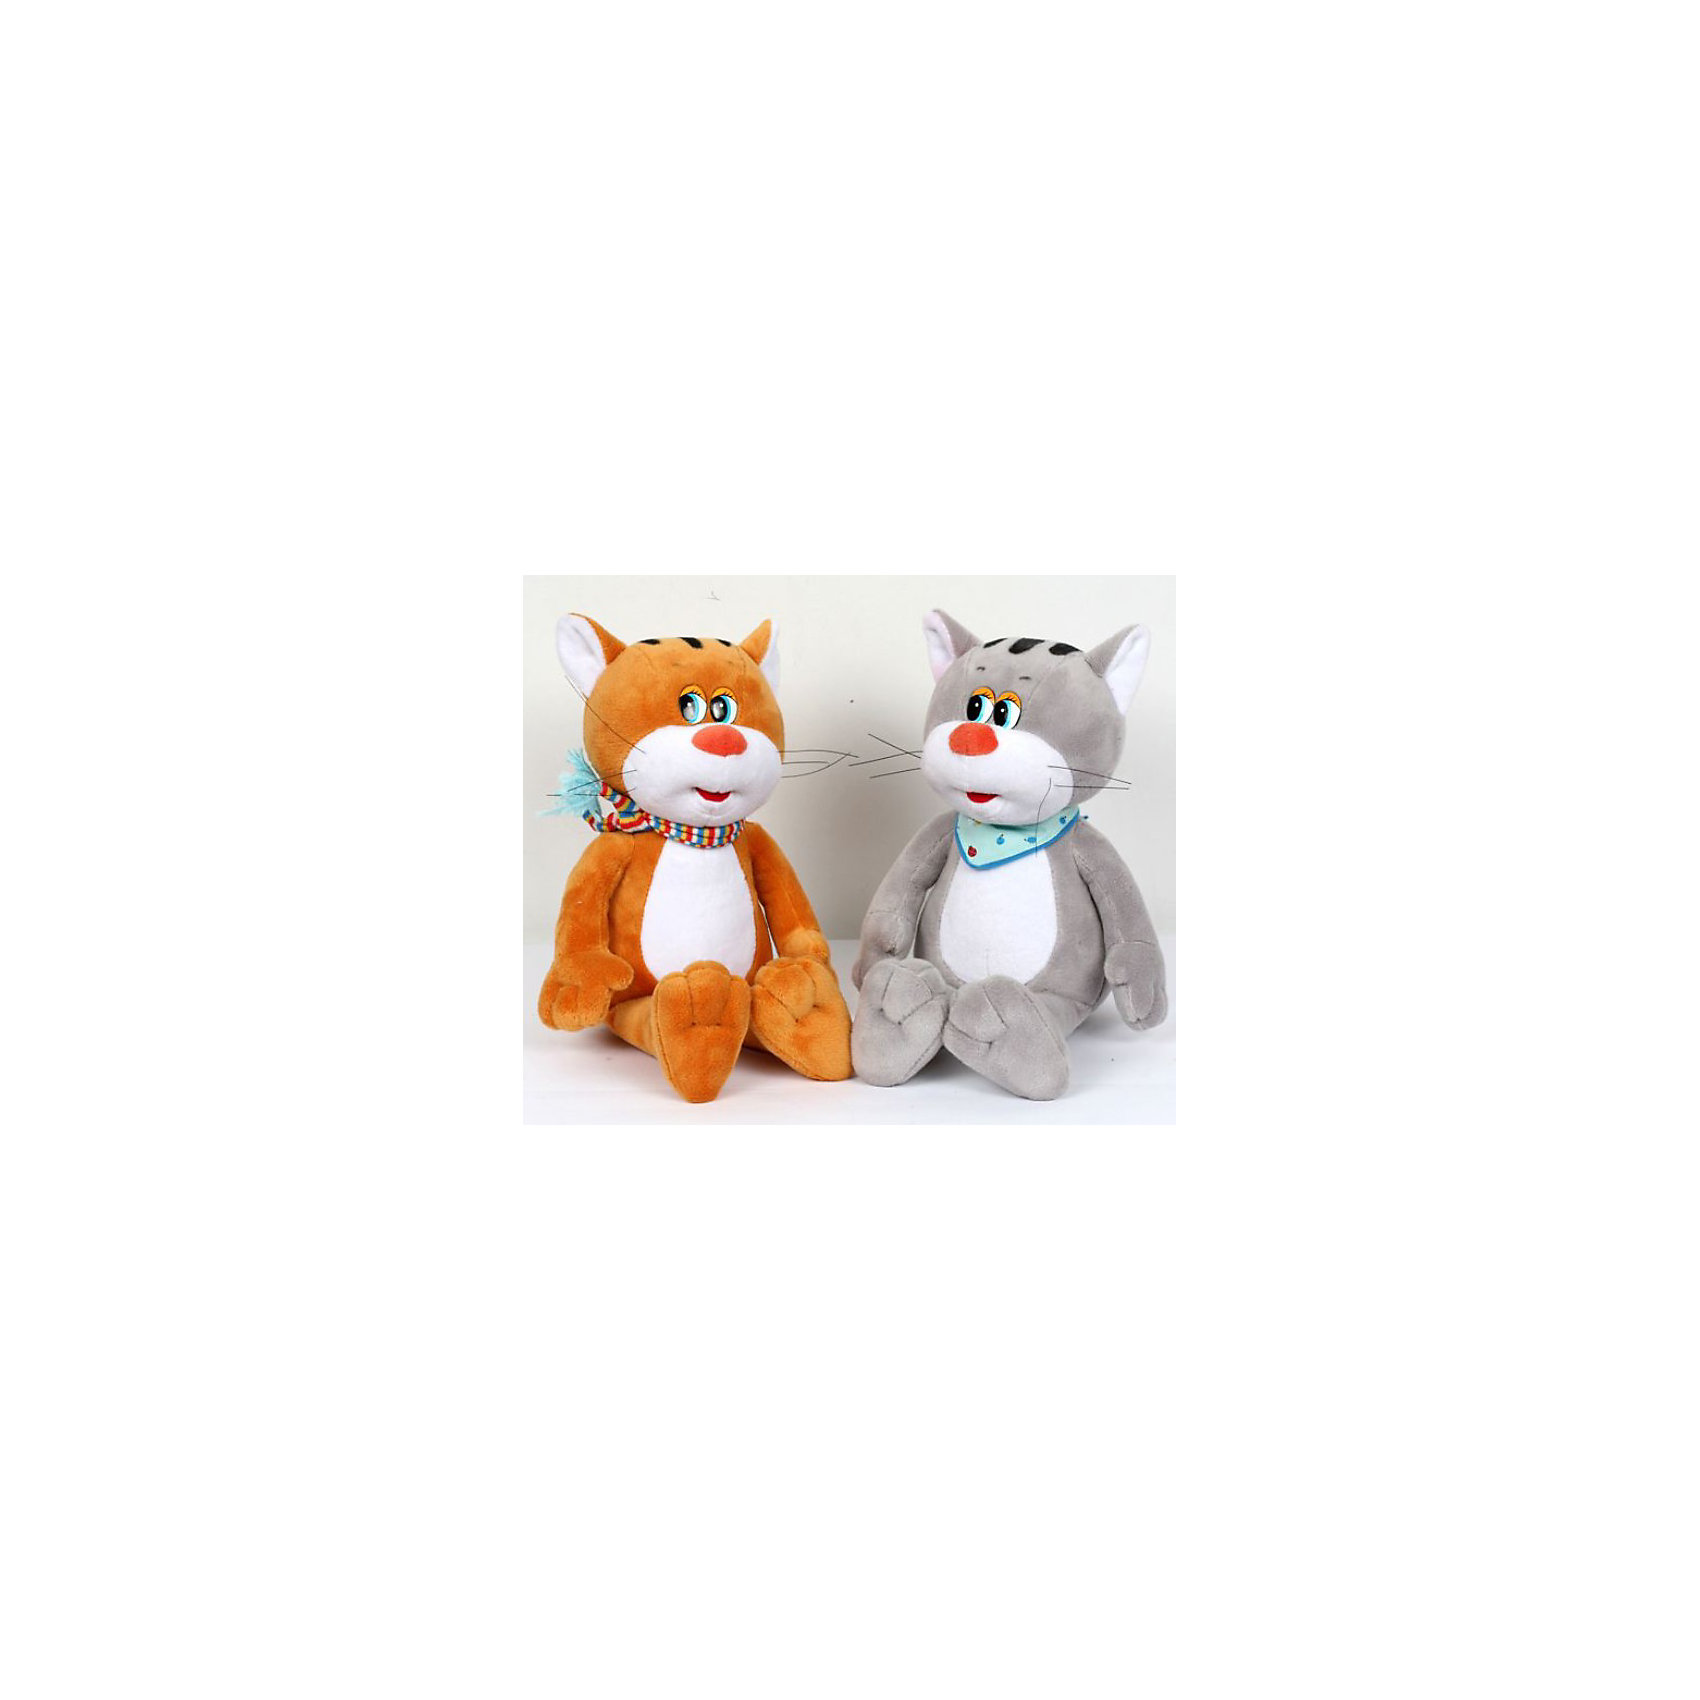 Мягкая игрушка Котенок с Лизюкова, 25 см, МУЛЬТИ-ПУЛЬТИ